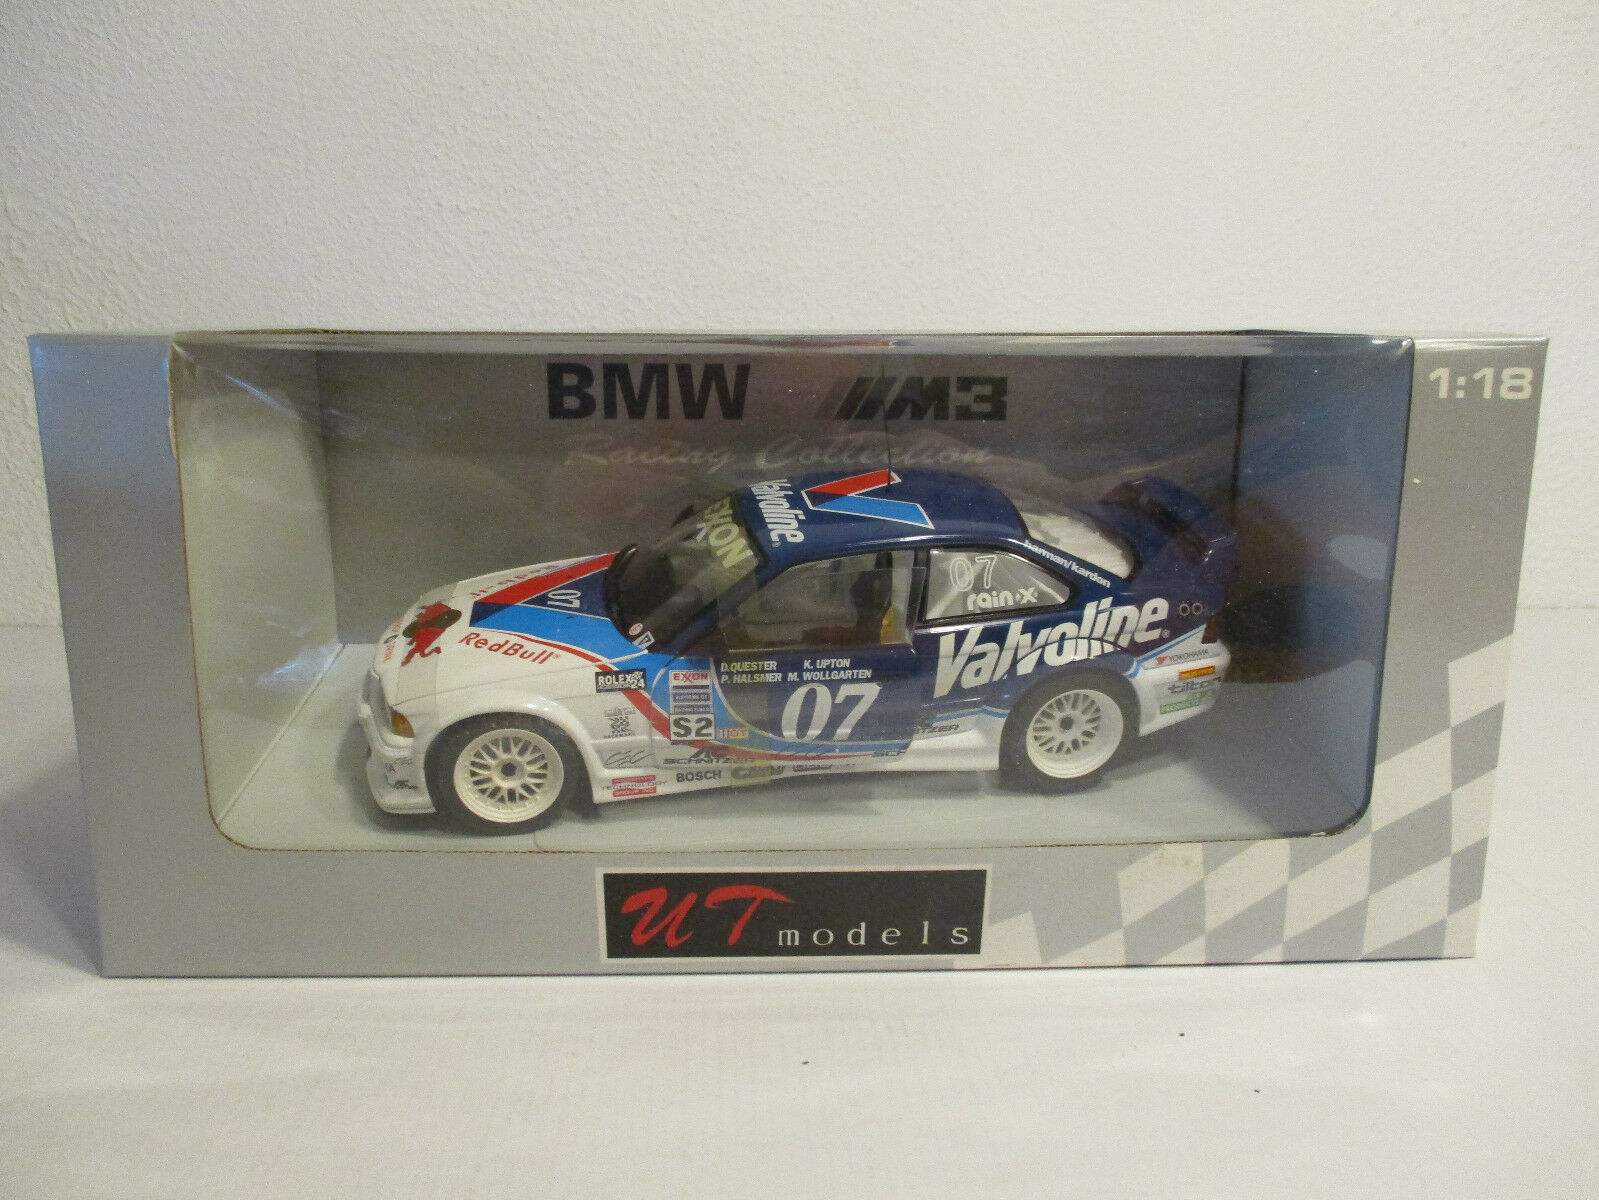 ( GOK ) 1 18 UT - Models  BMW M3 GTR  24h Dytona 1996  NEU OVP